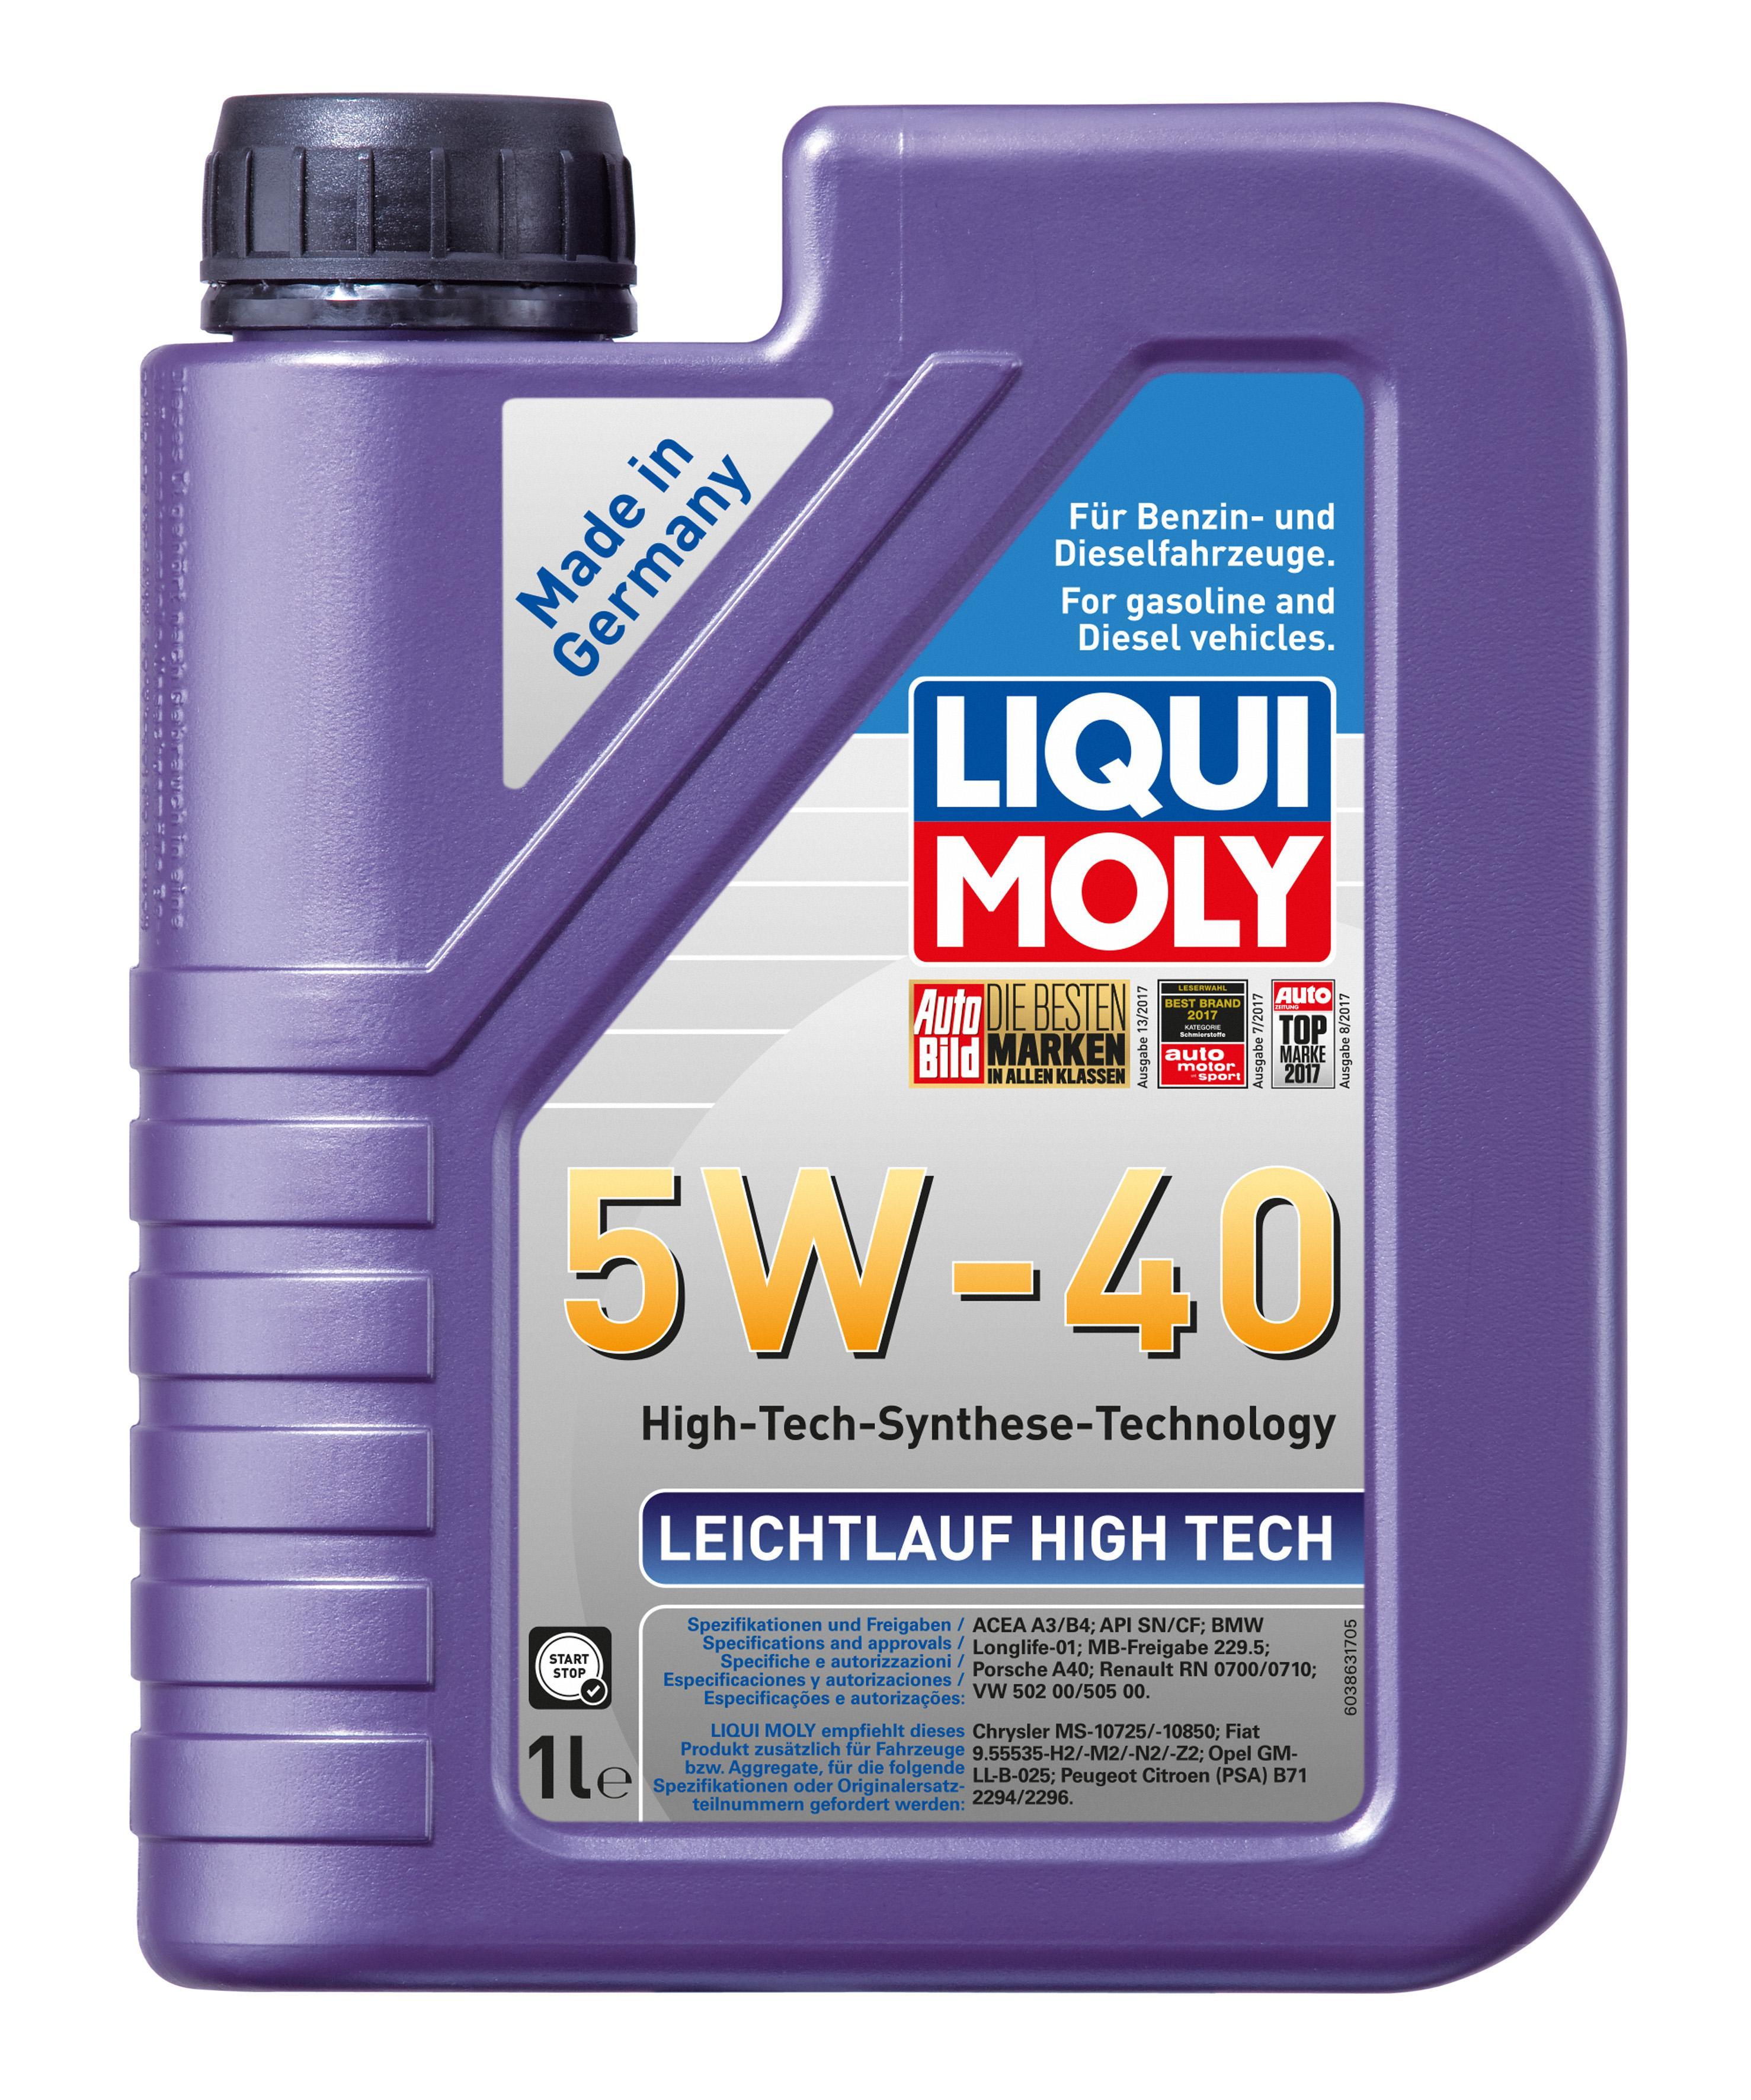 2327 LIQUI MOLY Motoröl Bewertung